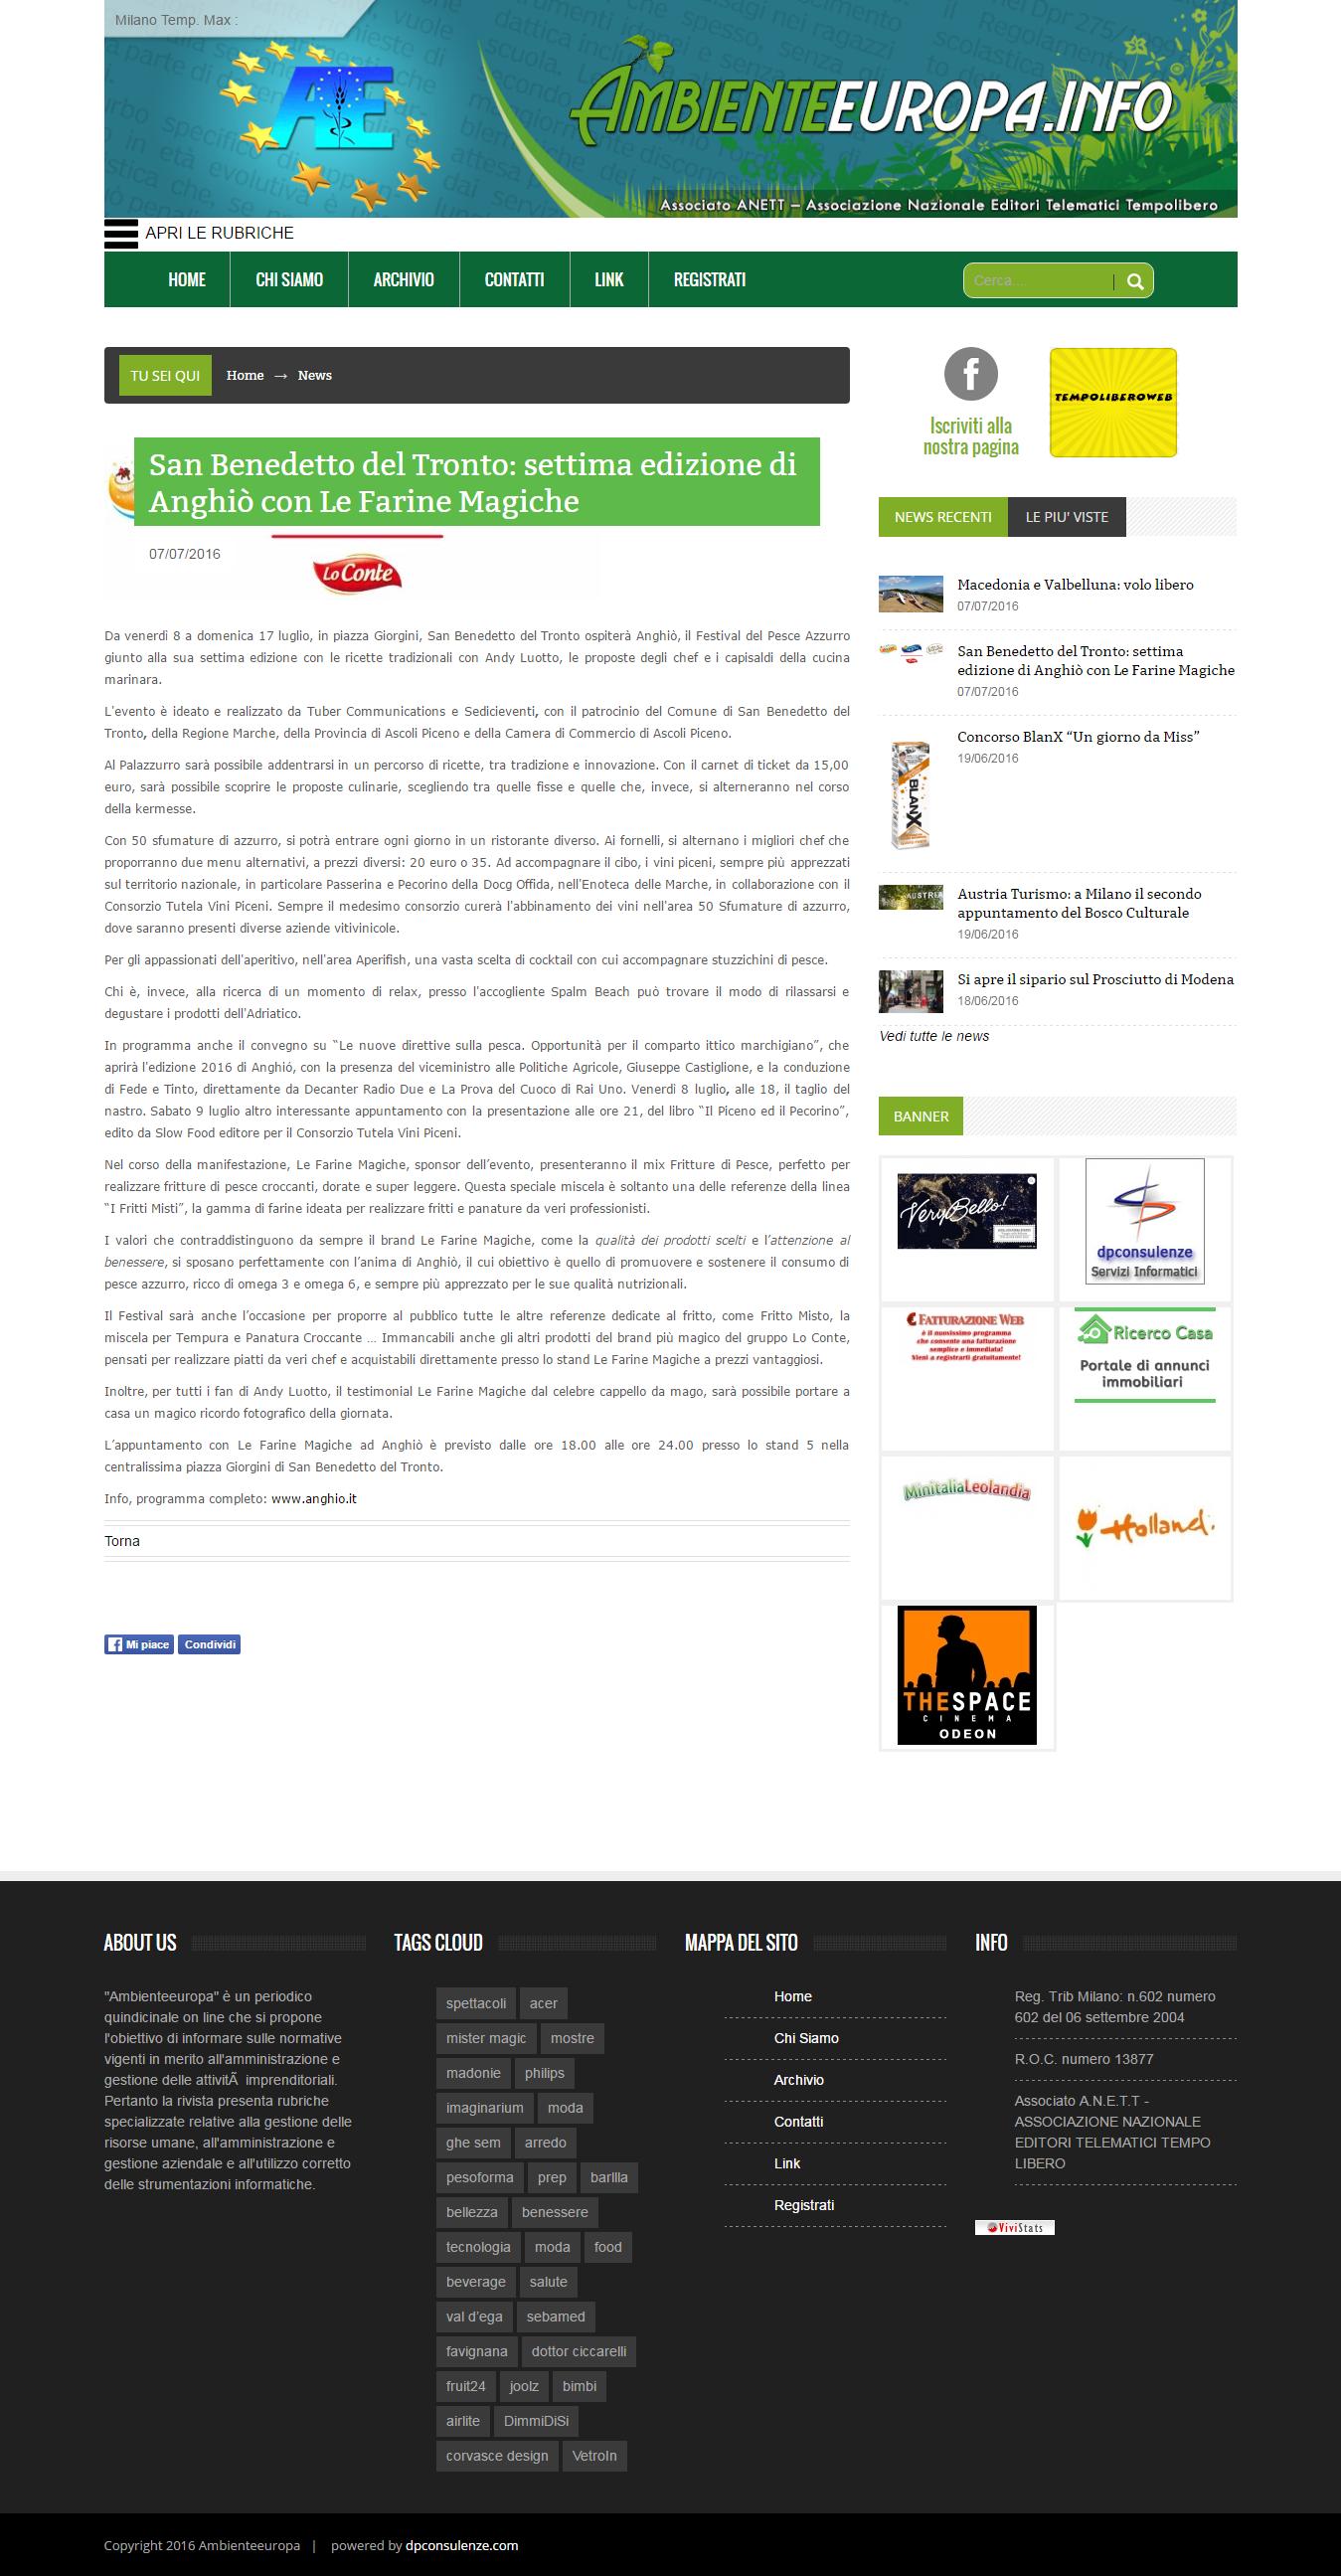 07.07.16_ambienteeuropa.info